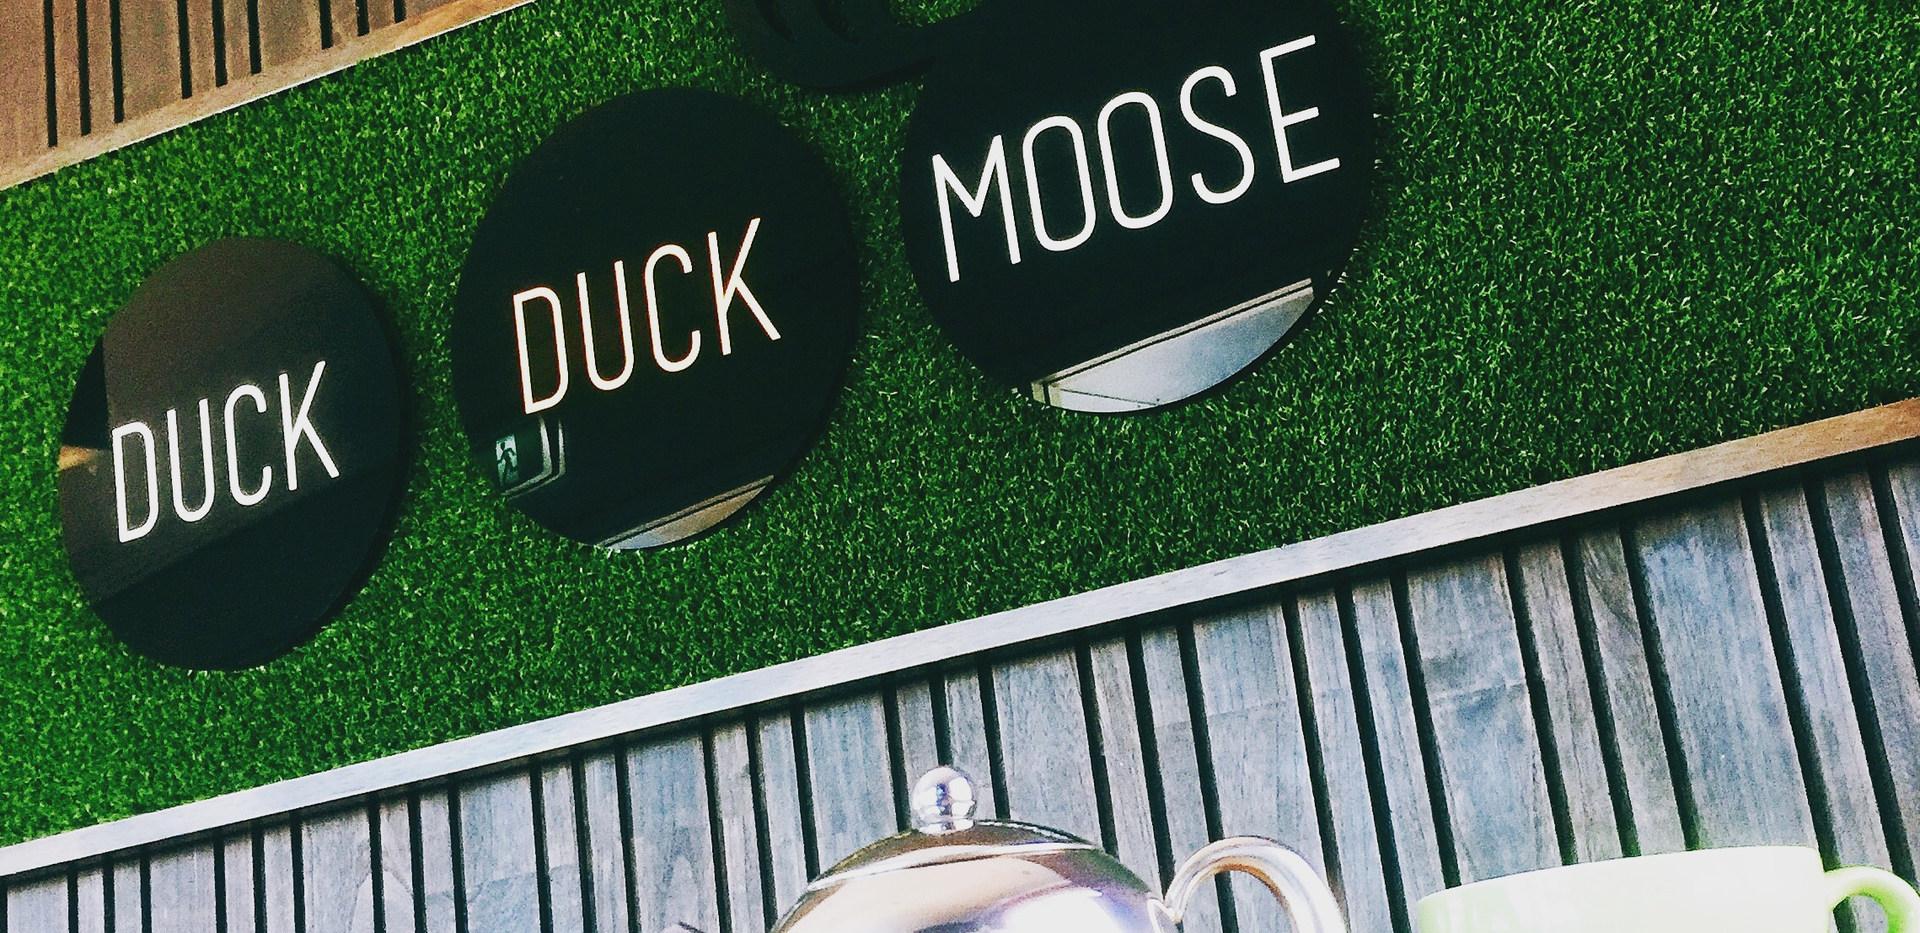 duck-duck-moose-6.jpeg